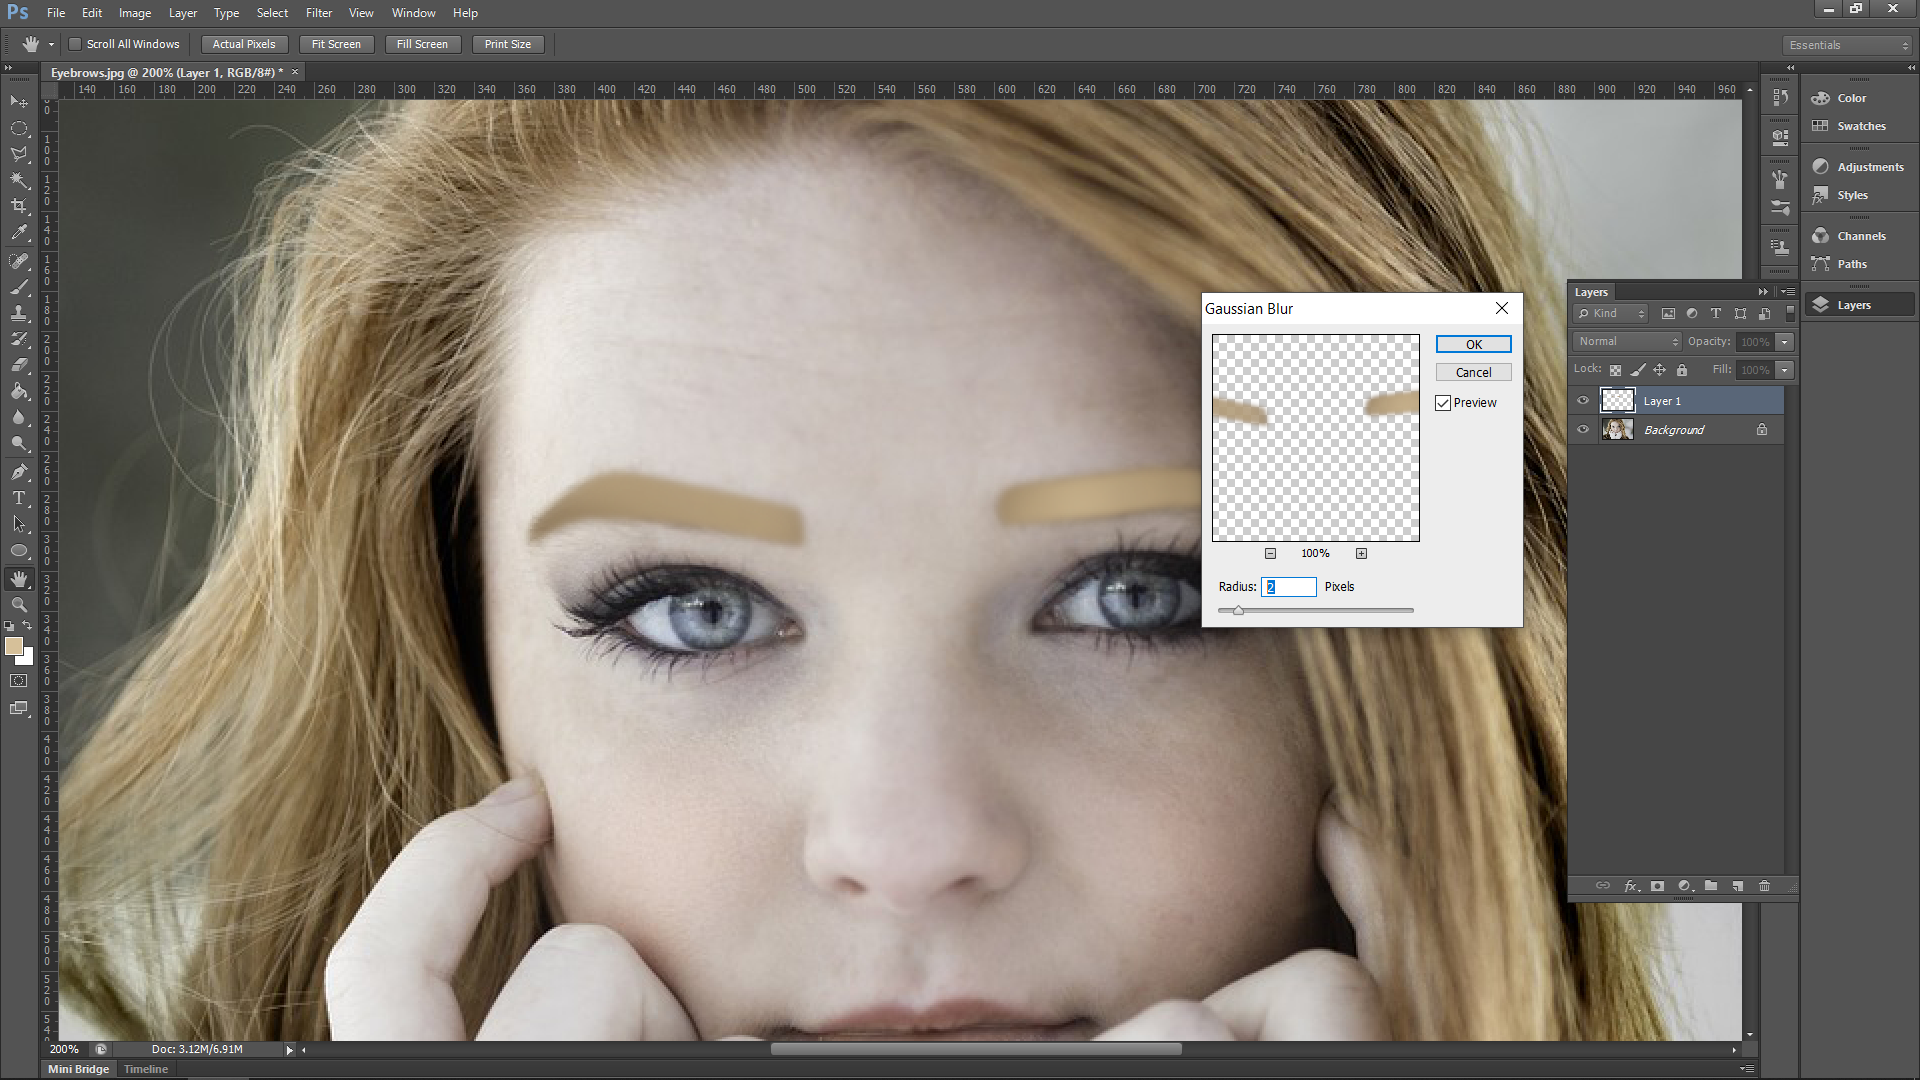 Photoshopping Eyebrows